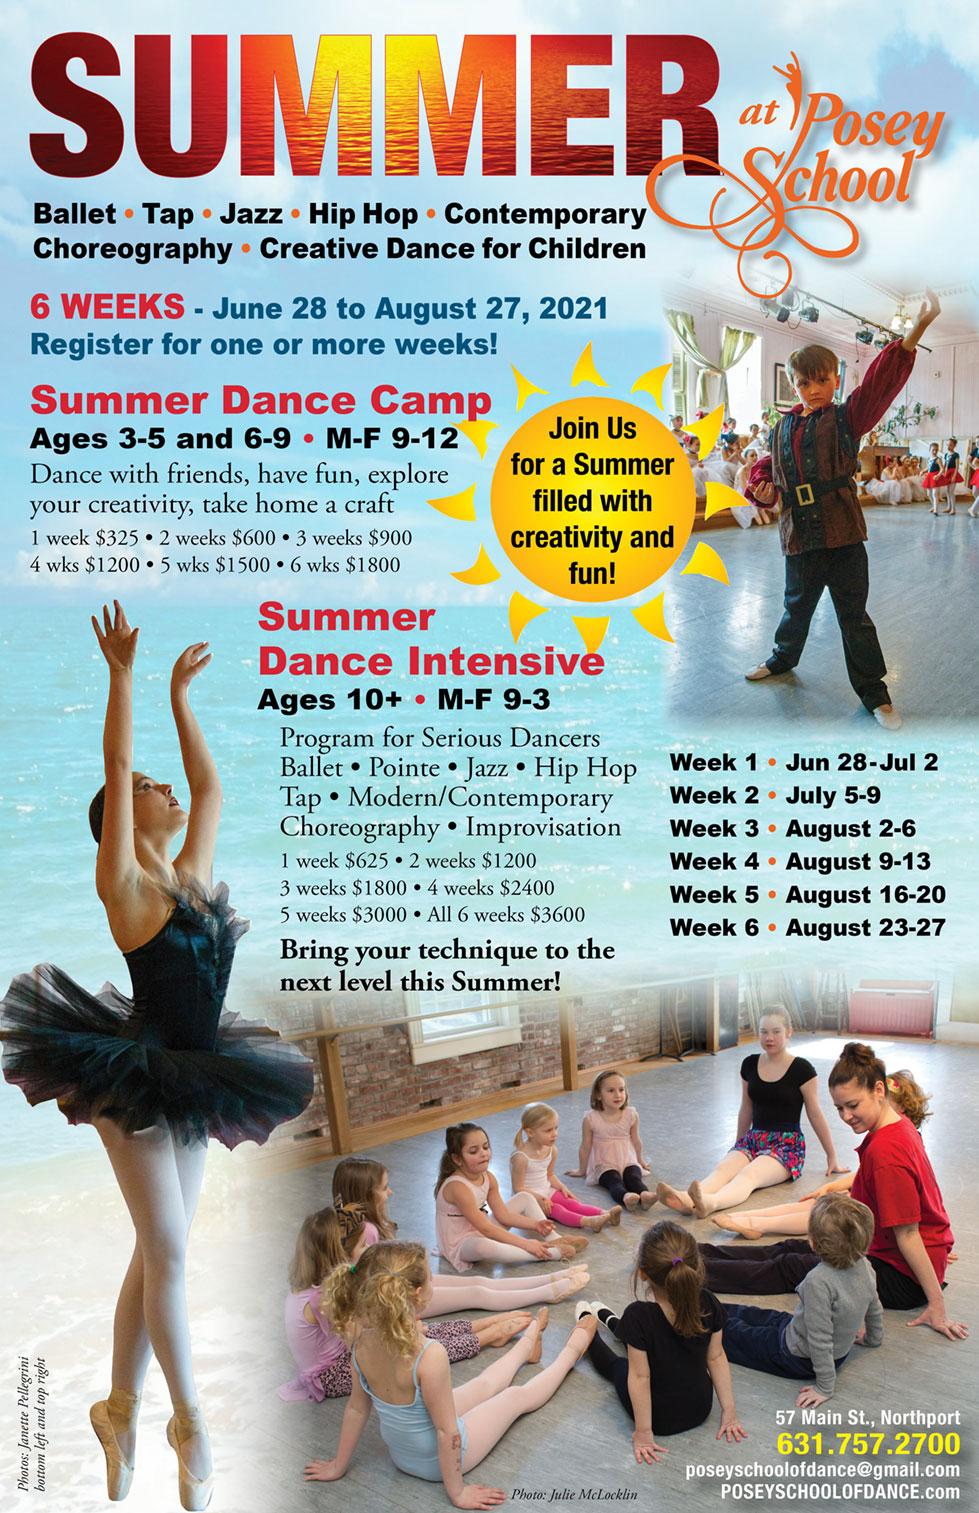 Summer Dance Camp & Summer Dance Intensive at Posey School